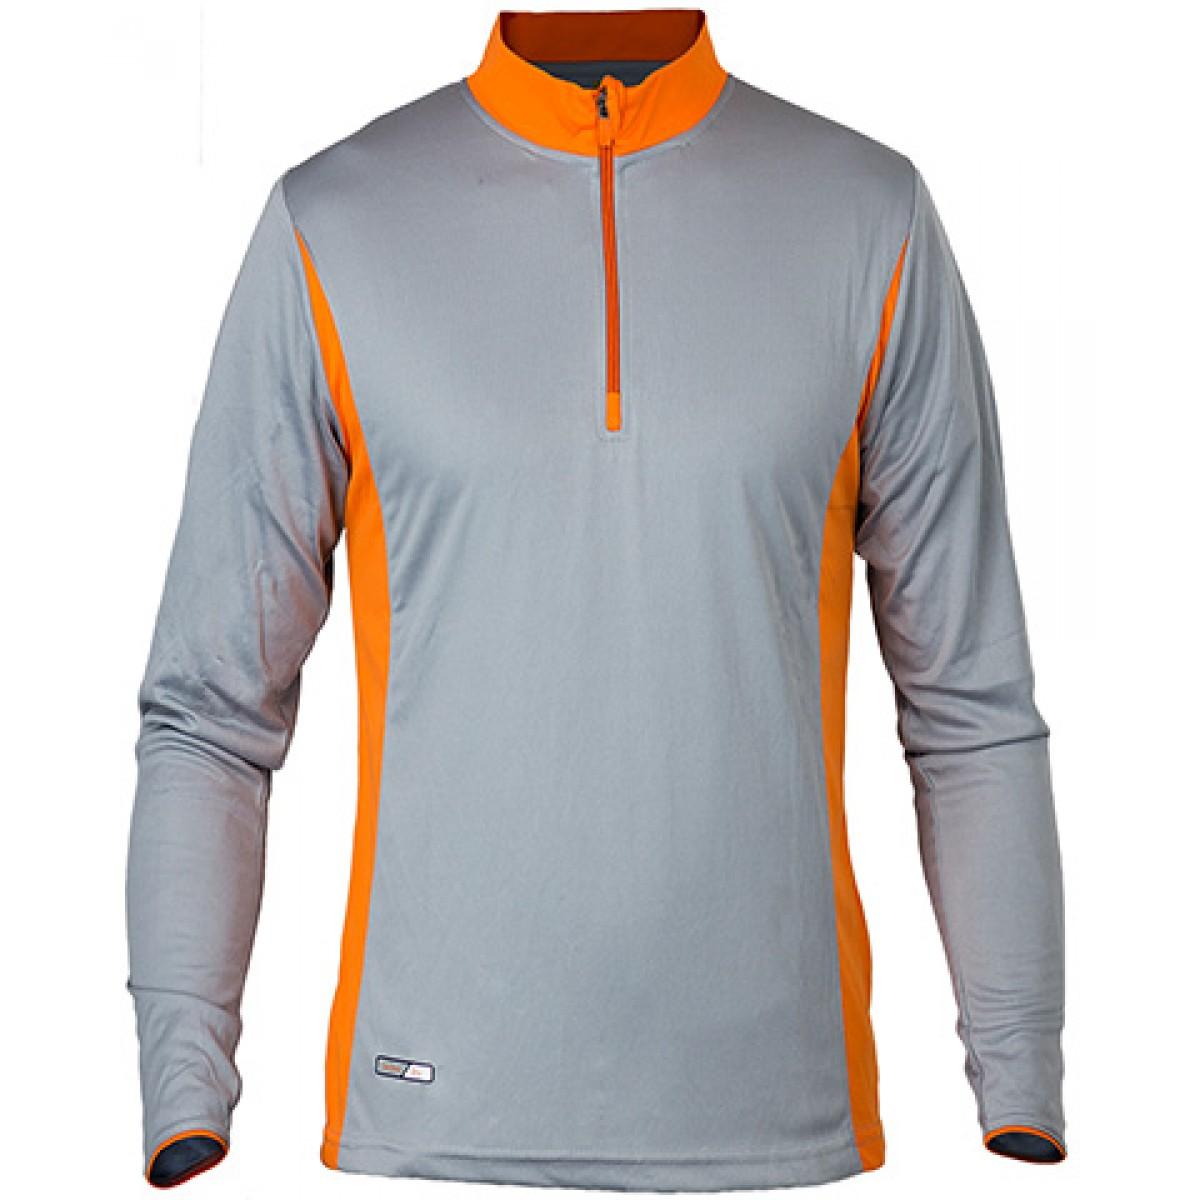 Long Sleeves 3/4 Zip Performance With Side Insert-Neon Orange -M